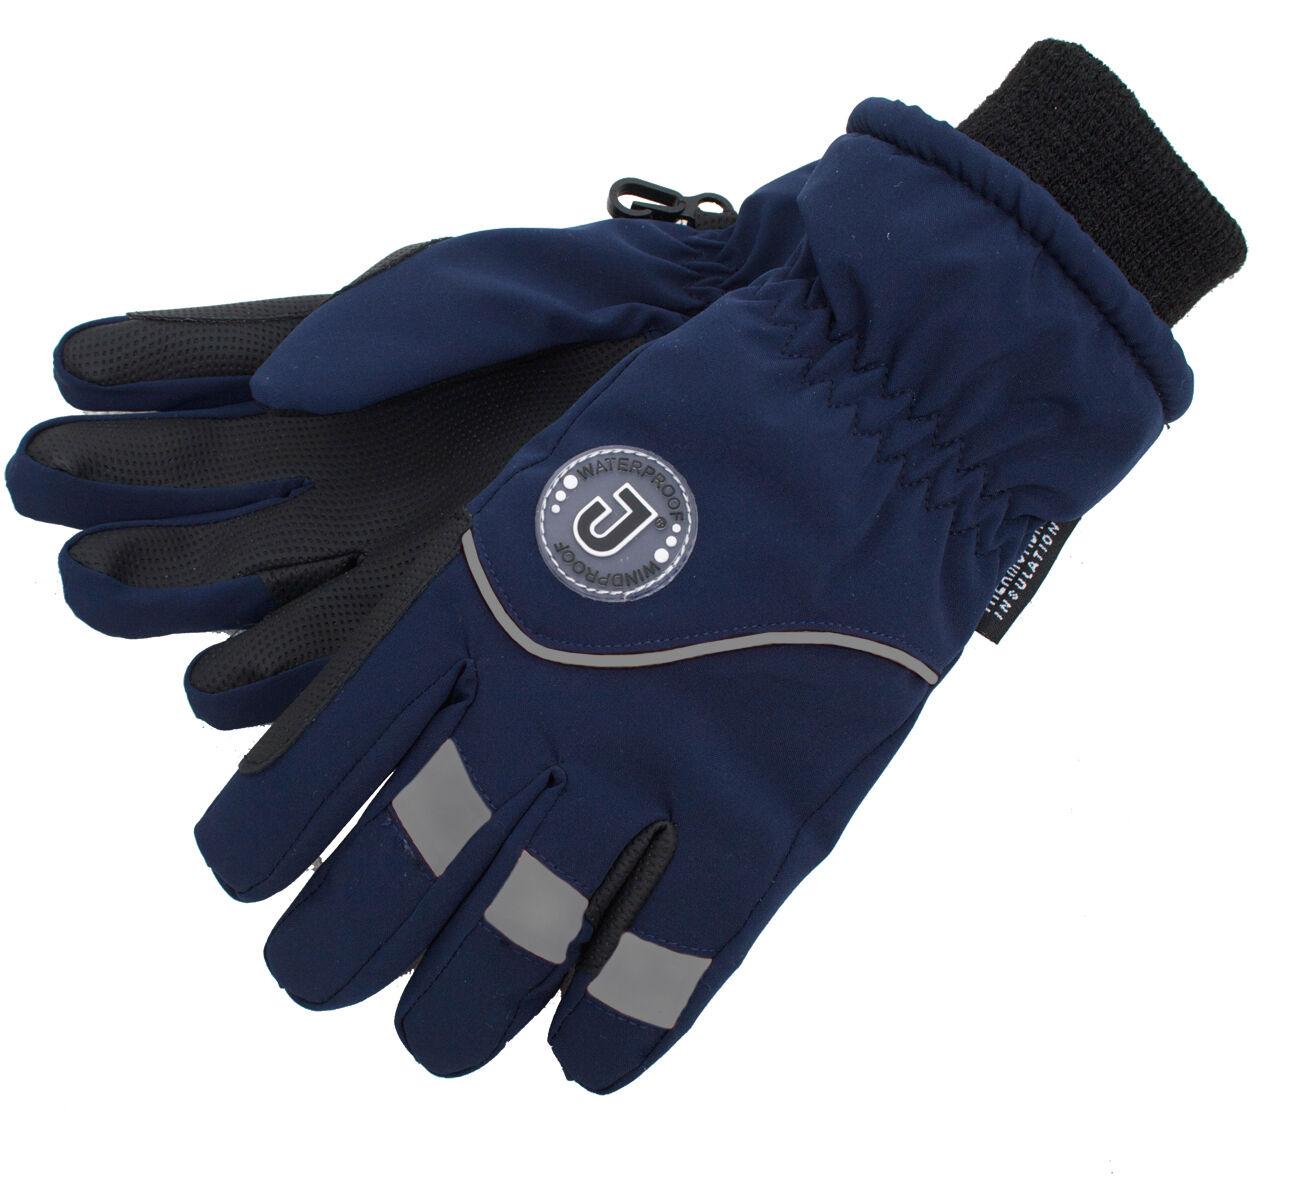 Jacson 5-Finger Handske Thermo Marin S